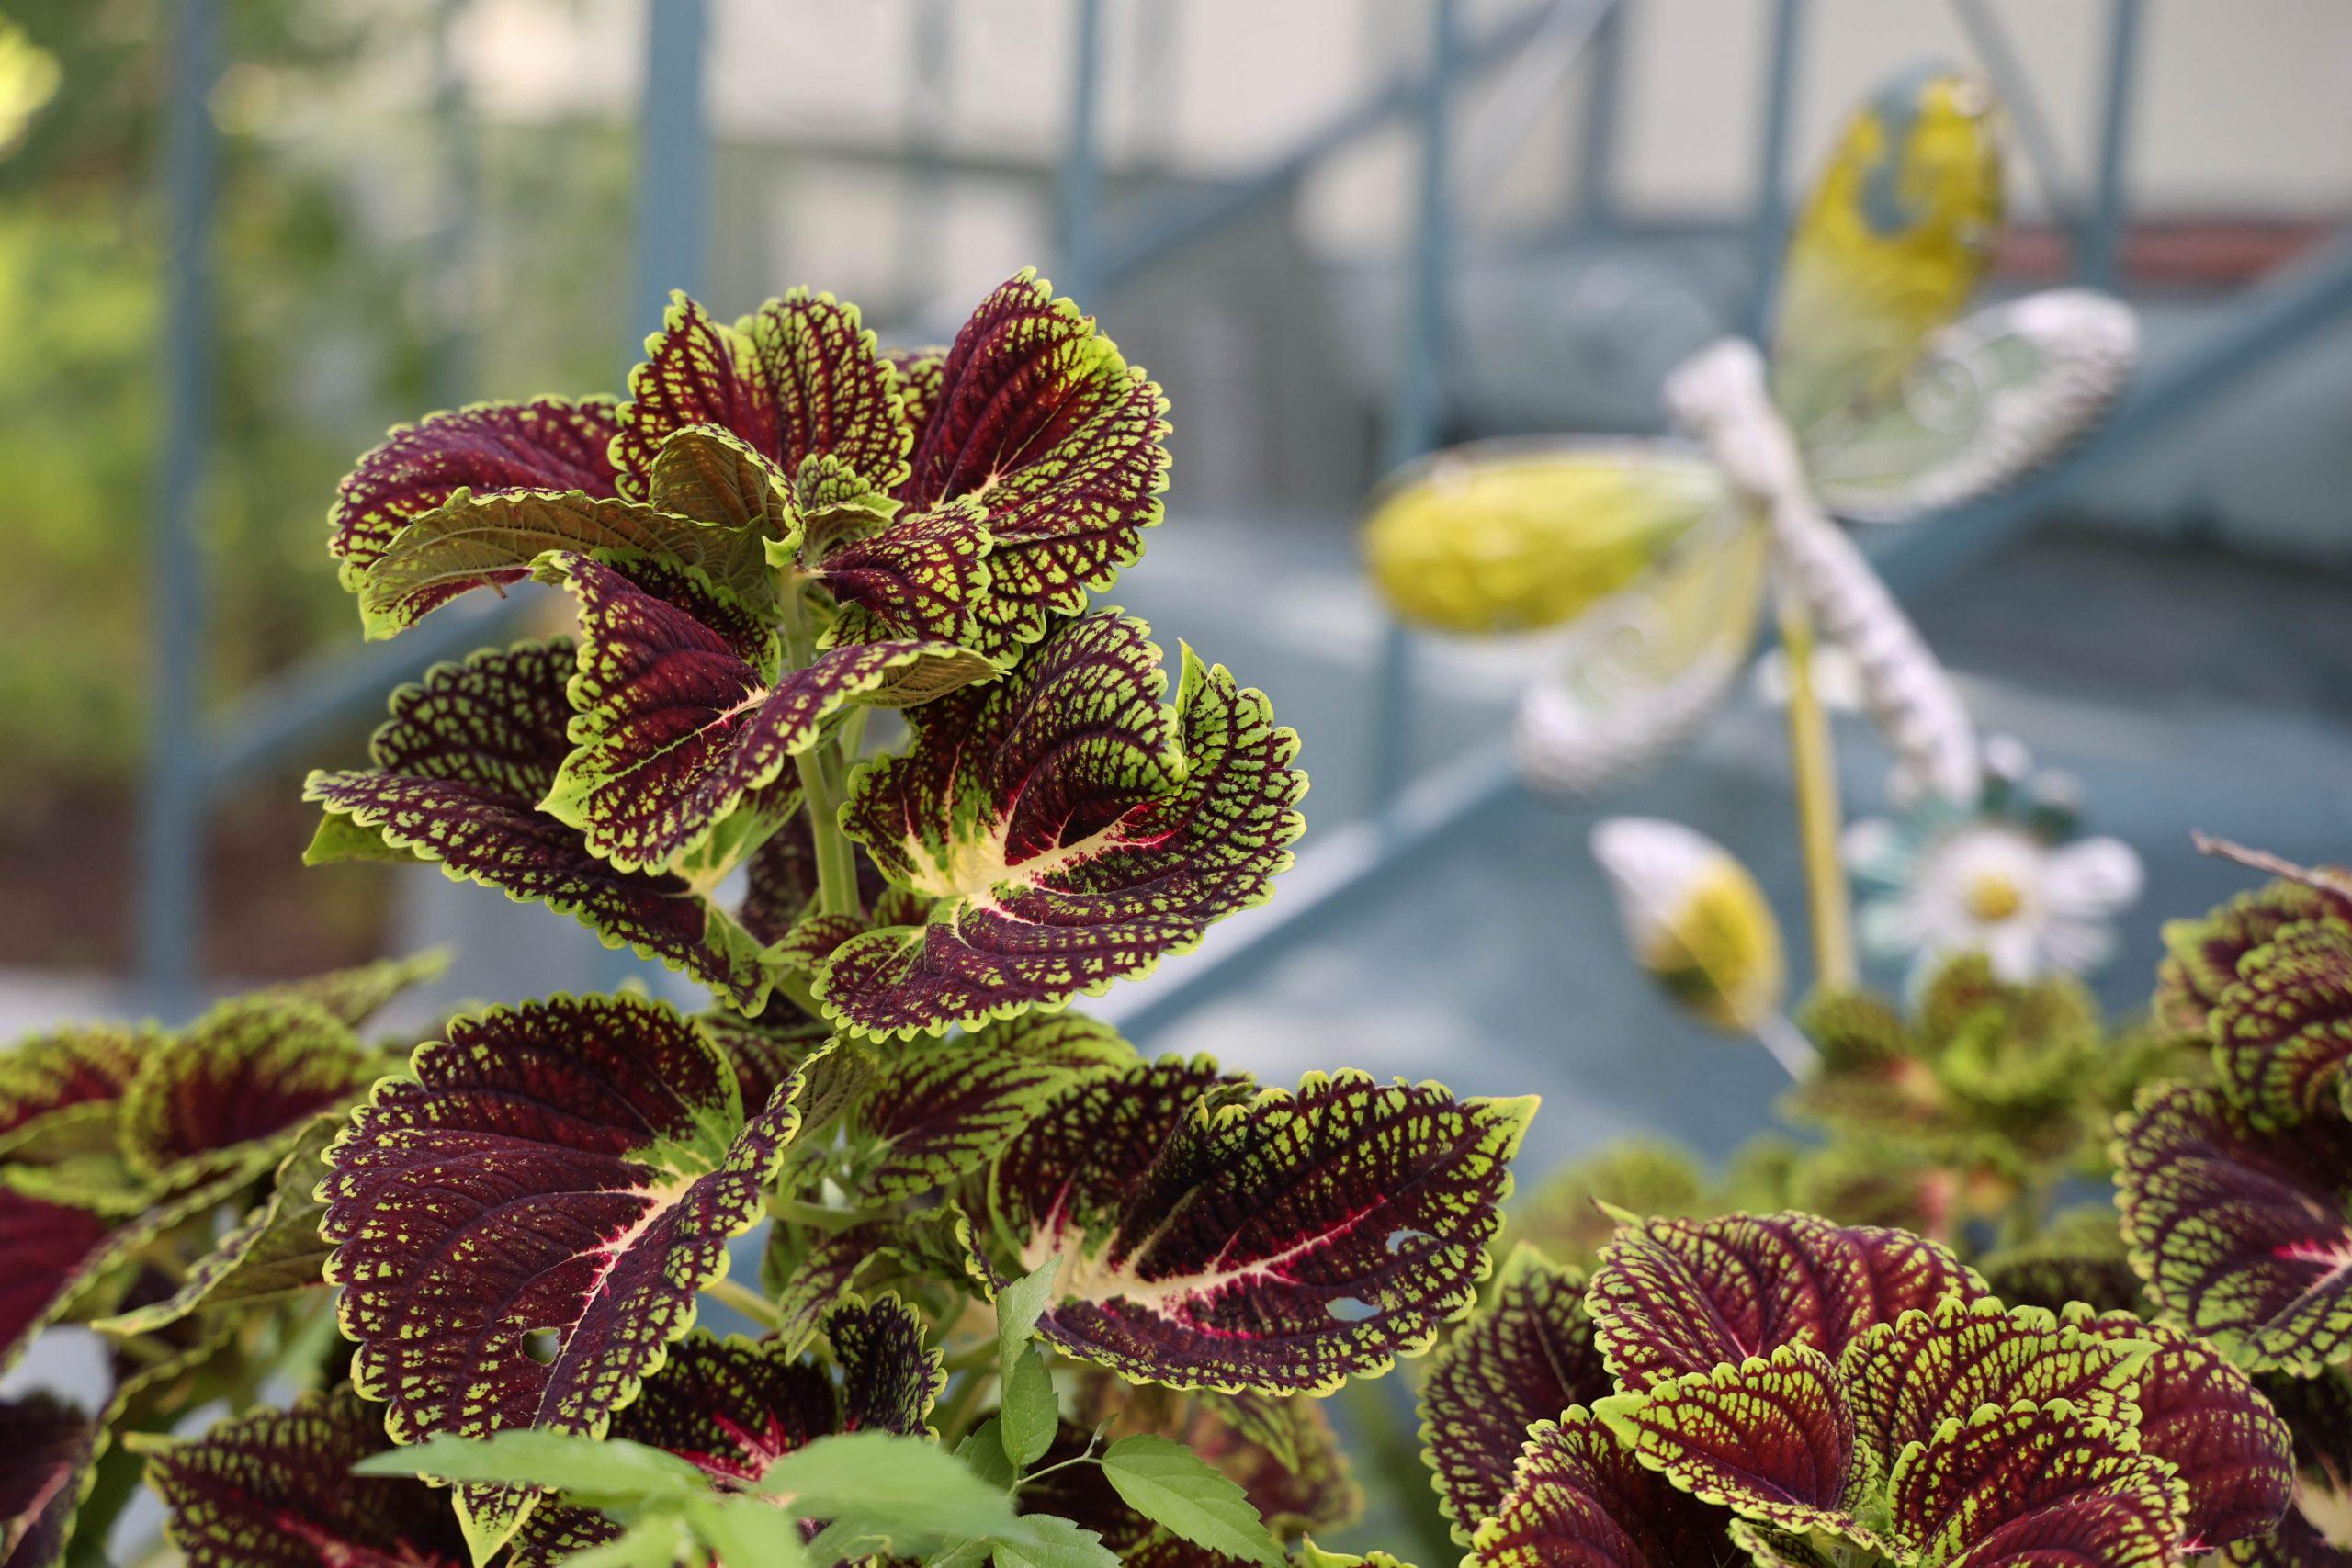 A unique looking plant grows in Baca's front garden.